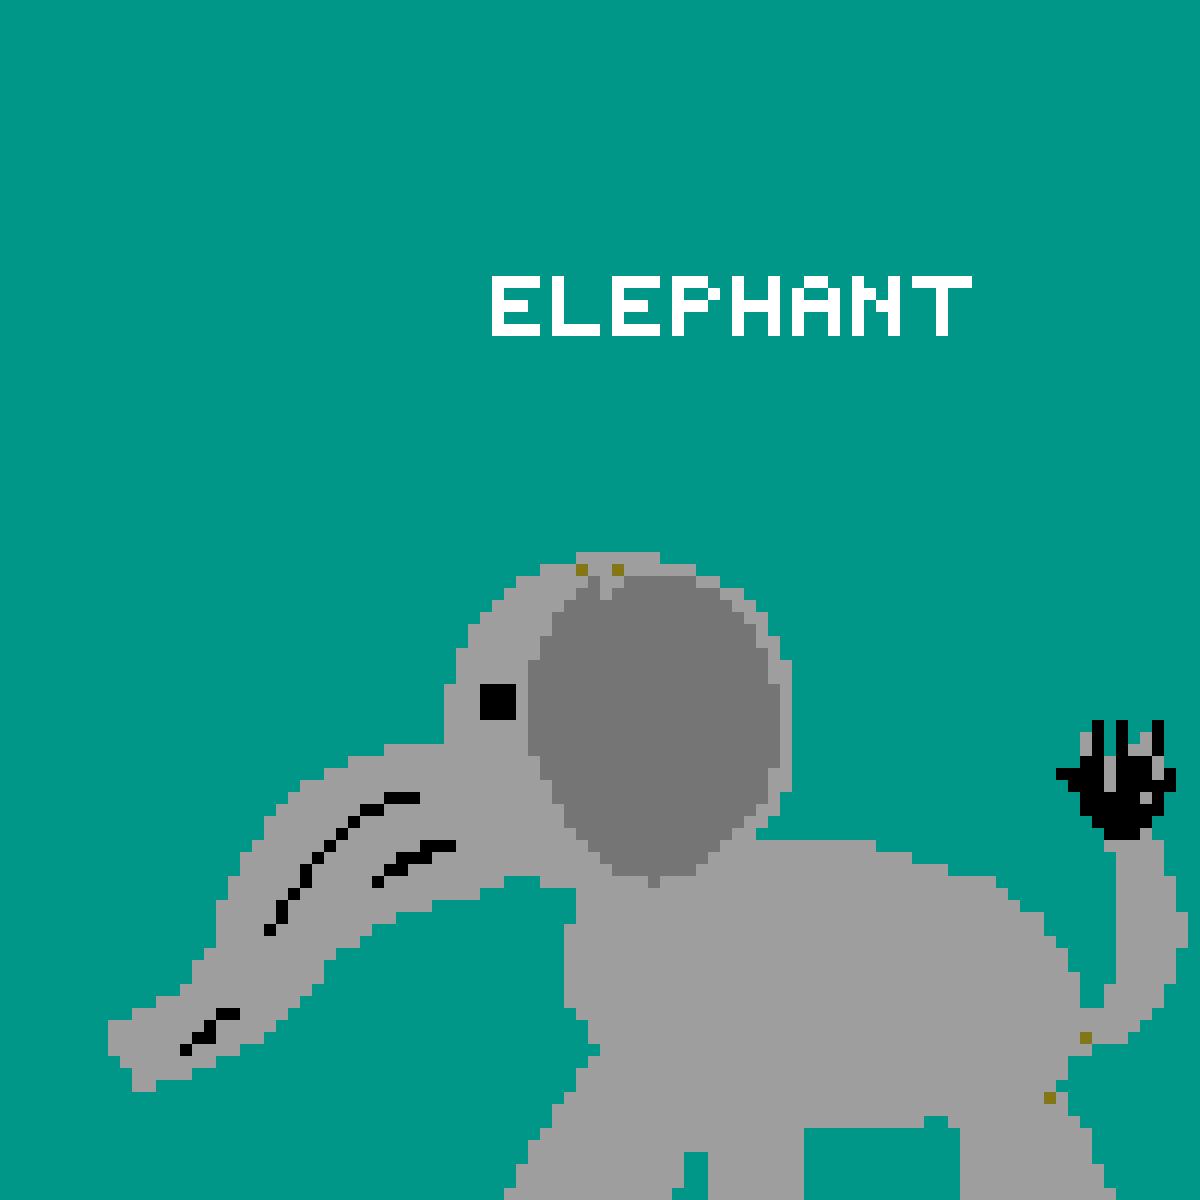 elephant by black-mamba